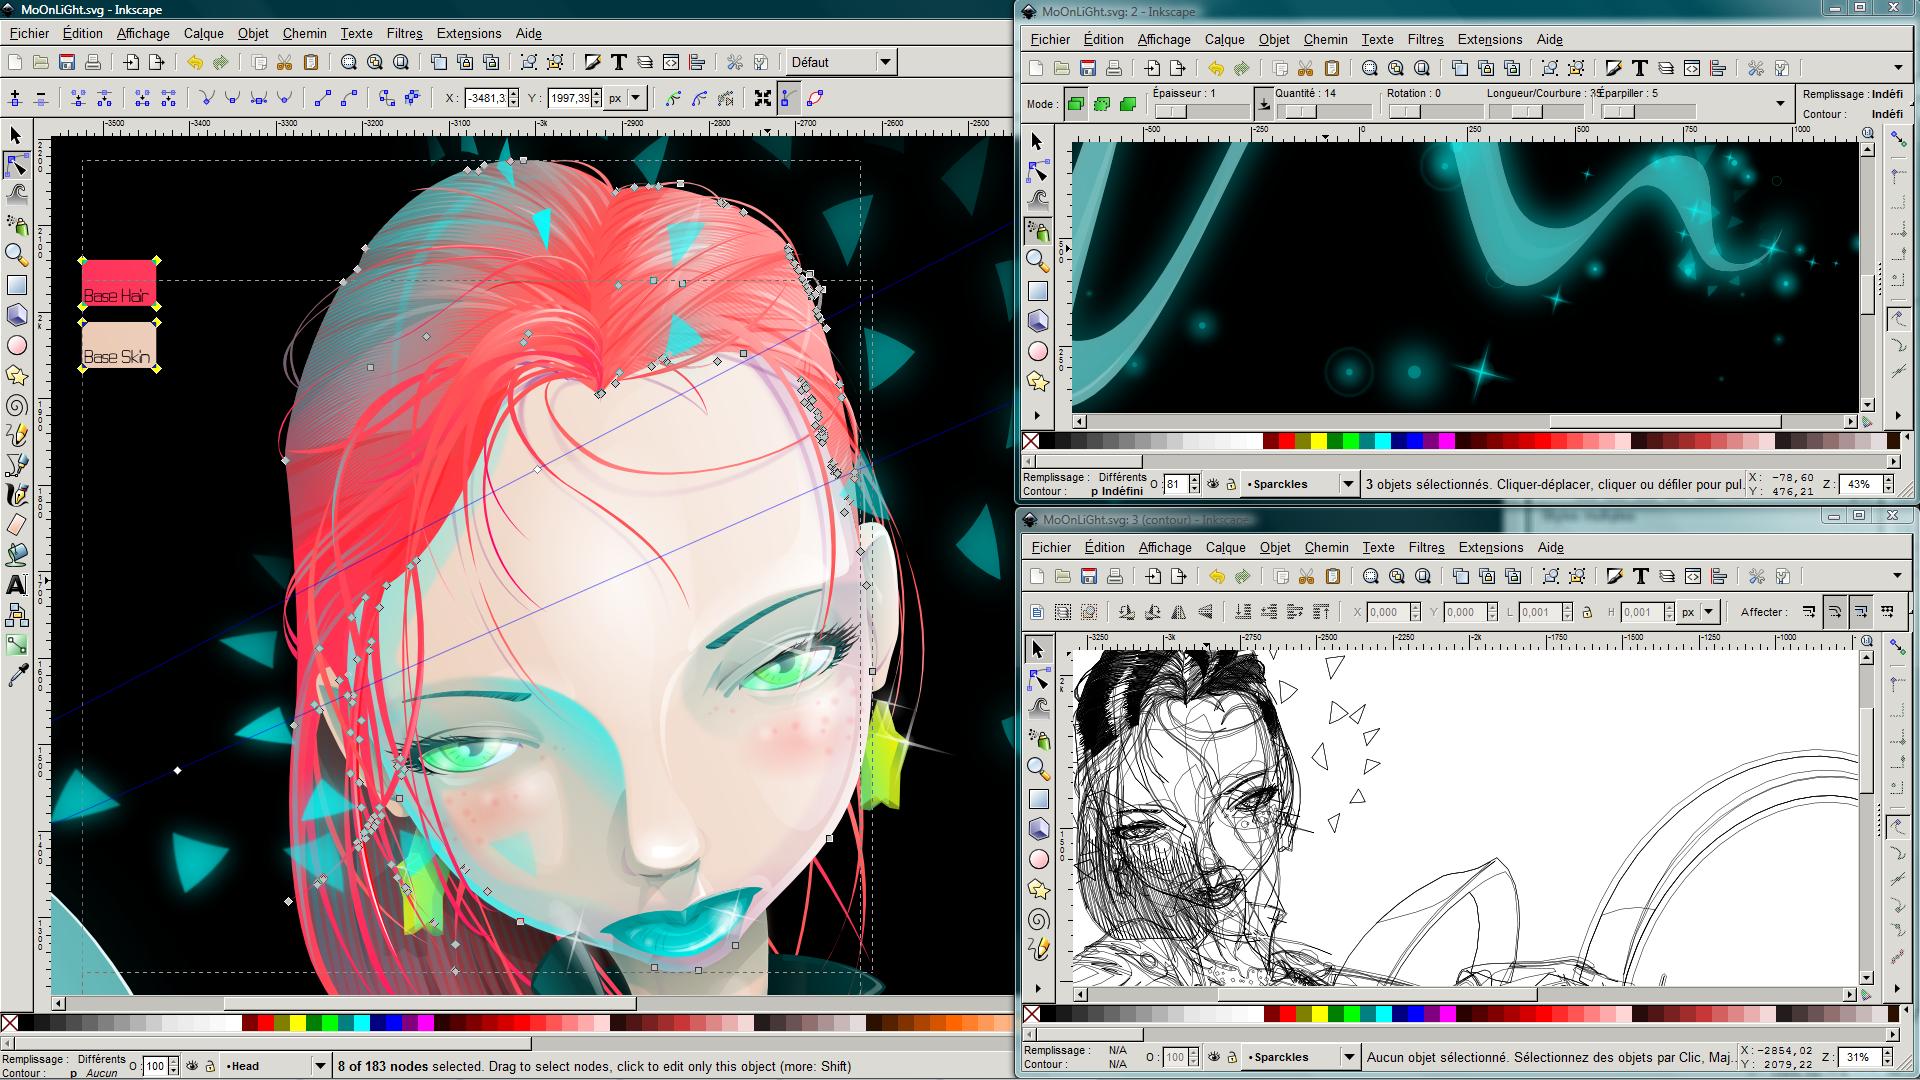 Coreldraw vector graphics - Inkscape Alternative To Adobe Illustrator An Open Source Vector Graphics Editor With Capabilities Similar To Illustrator Coreldraw Or Xara X